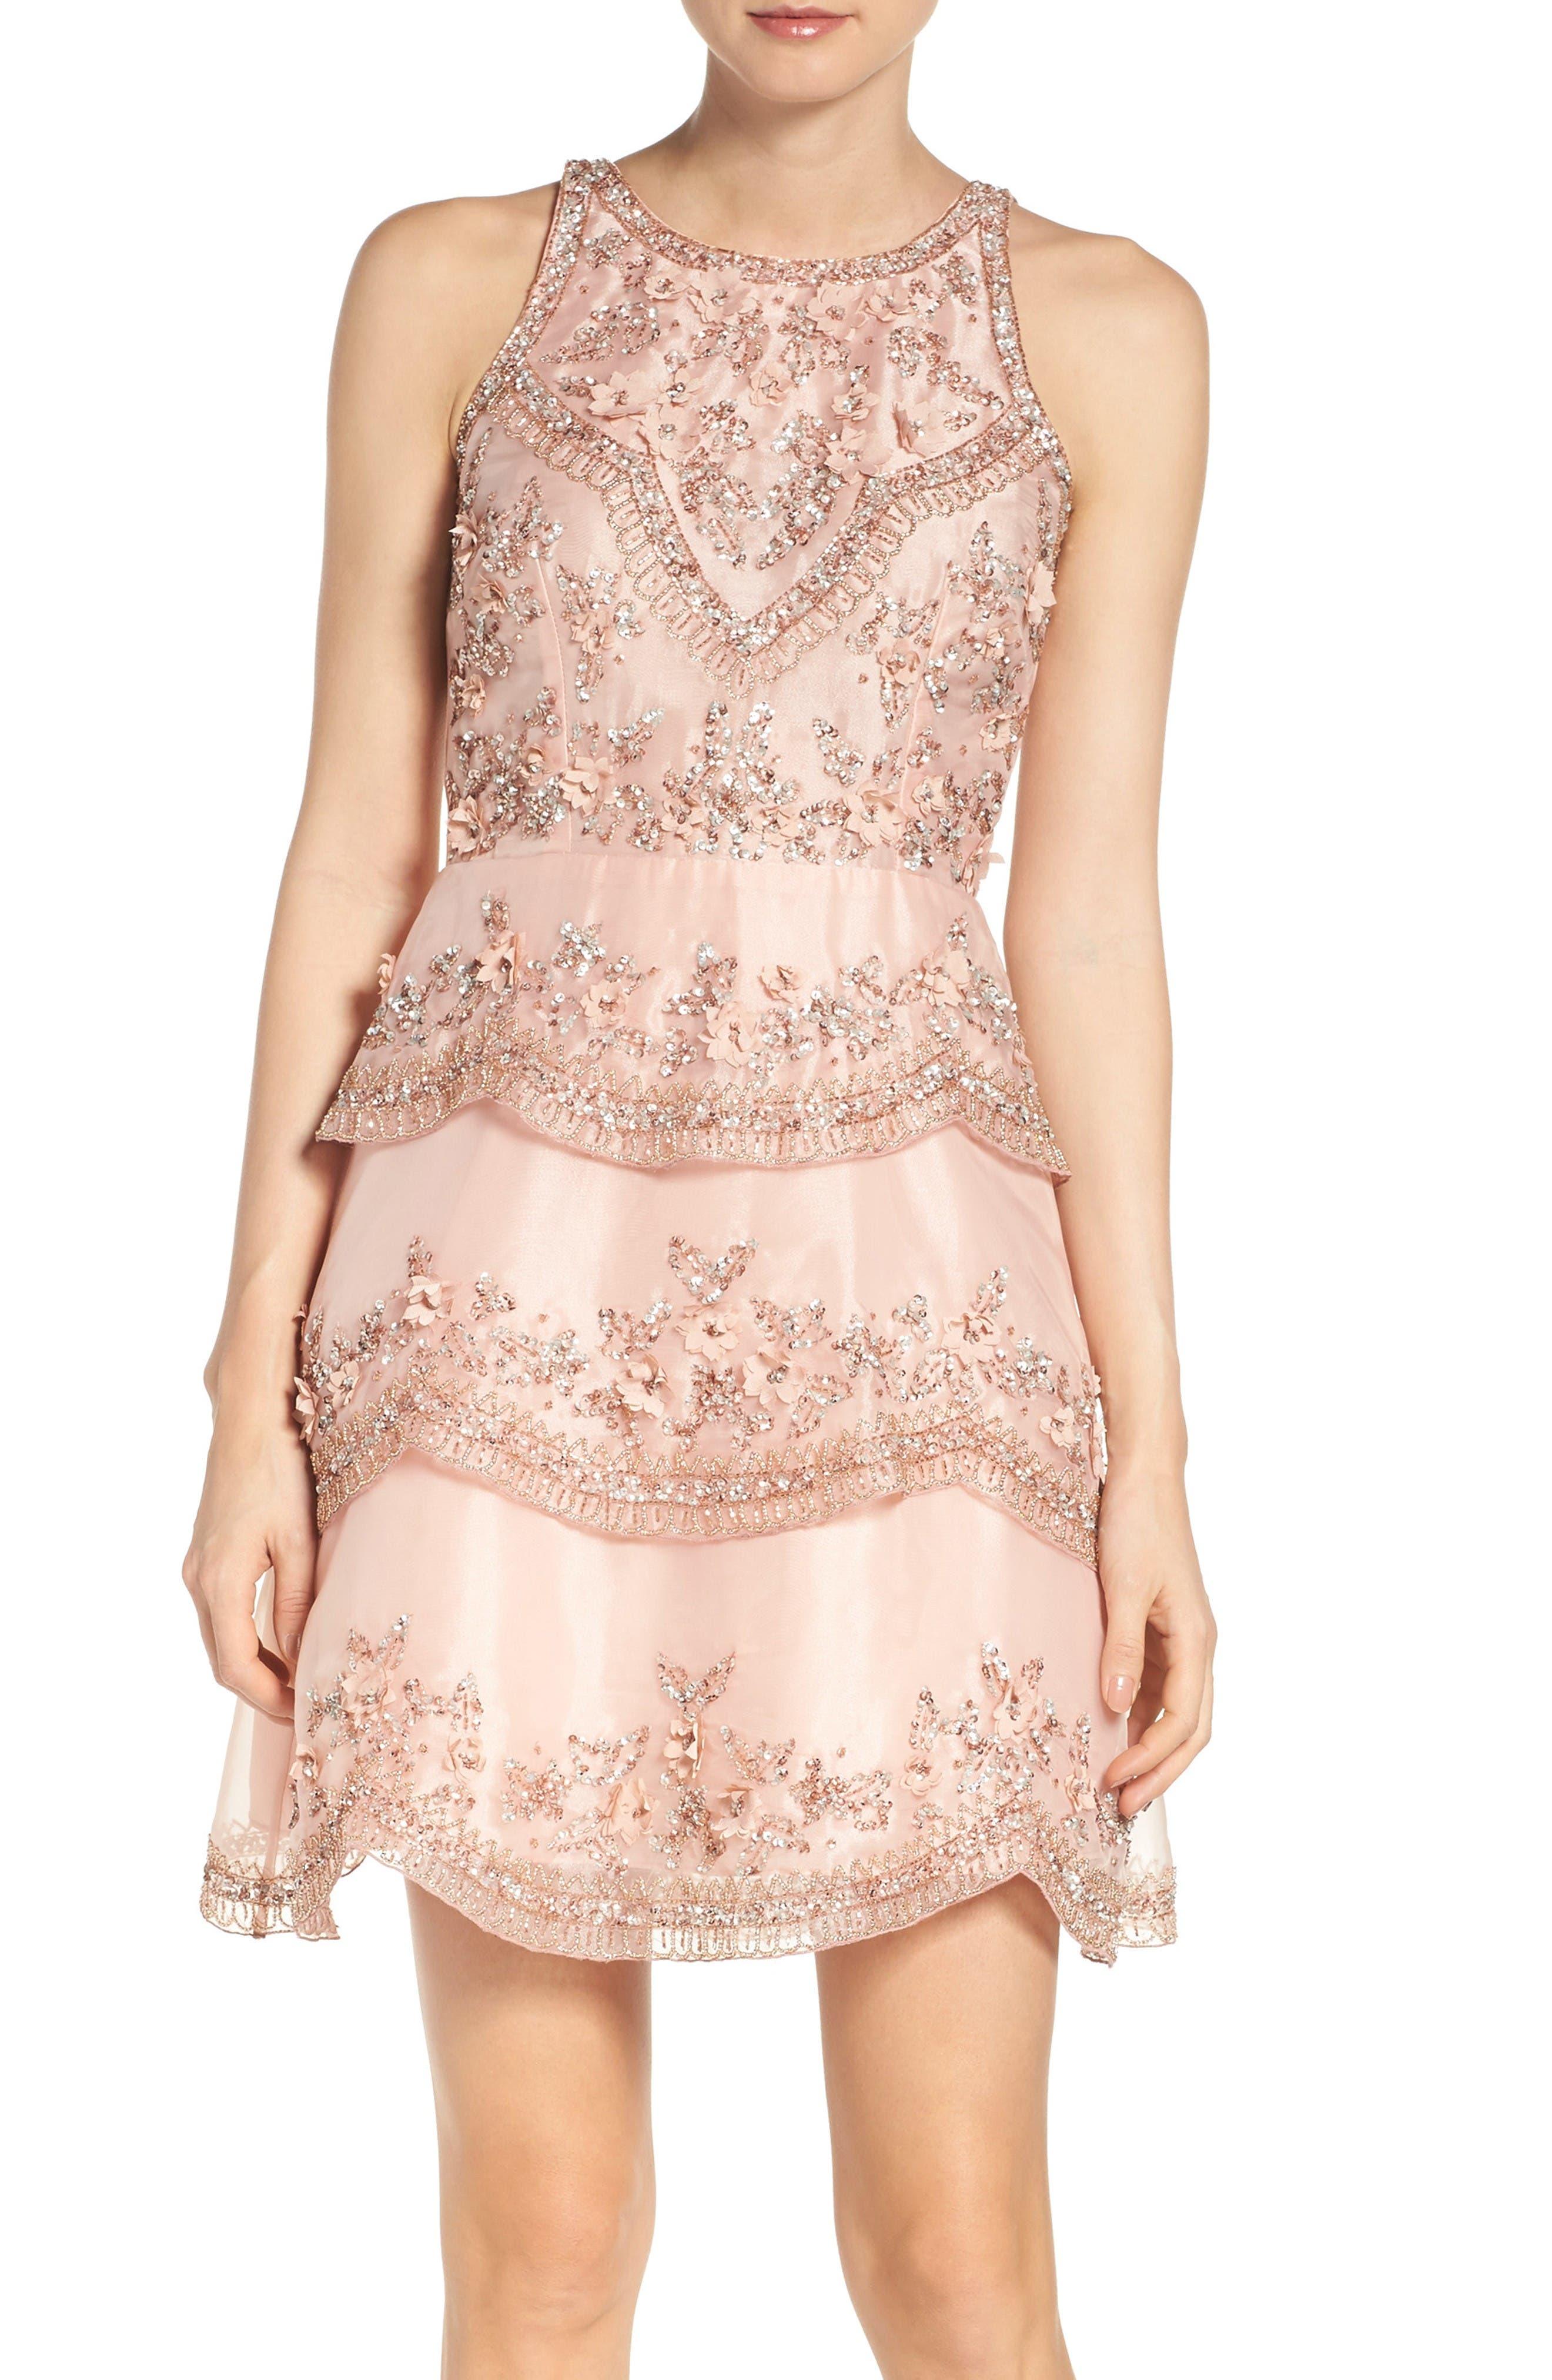 Main Image - Adrianna Papell Scallop Dress